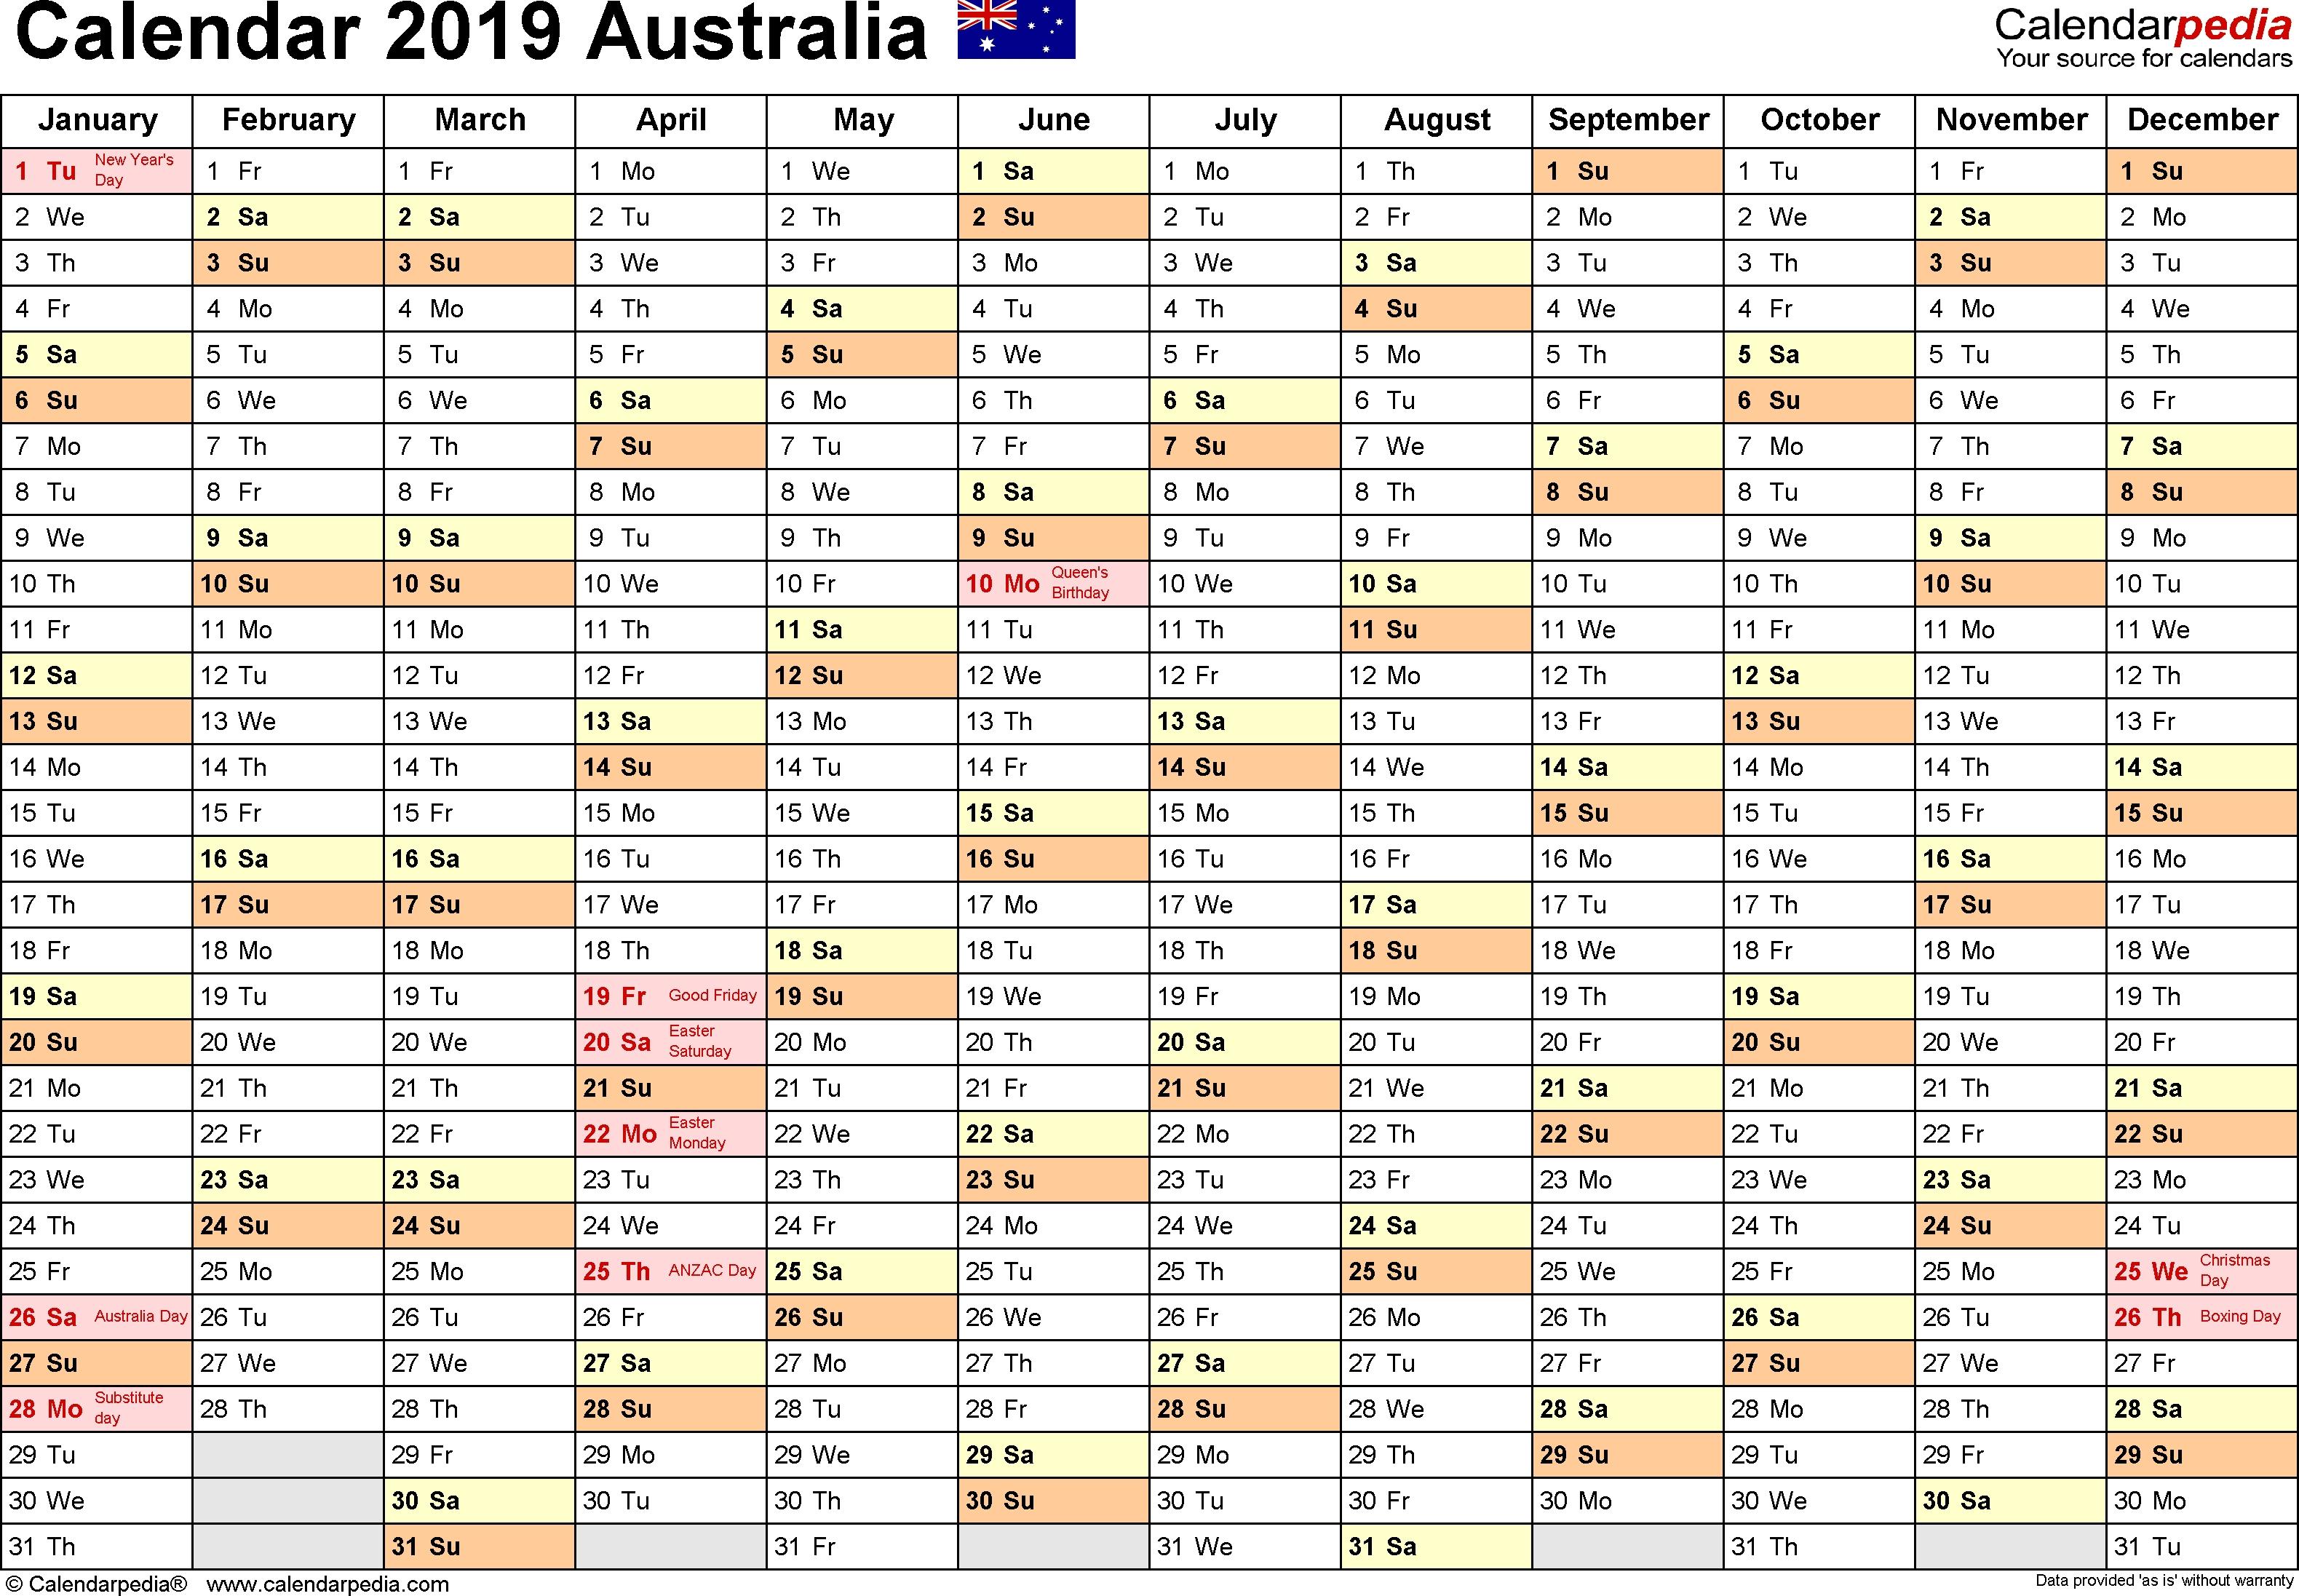 Australia Calendar 2019 - Free Printable Pdf Templates regarding Financial Calendar 2019- 2020 Printable.au